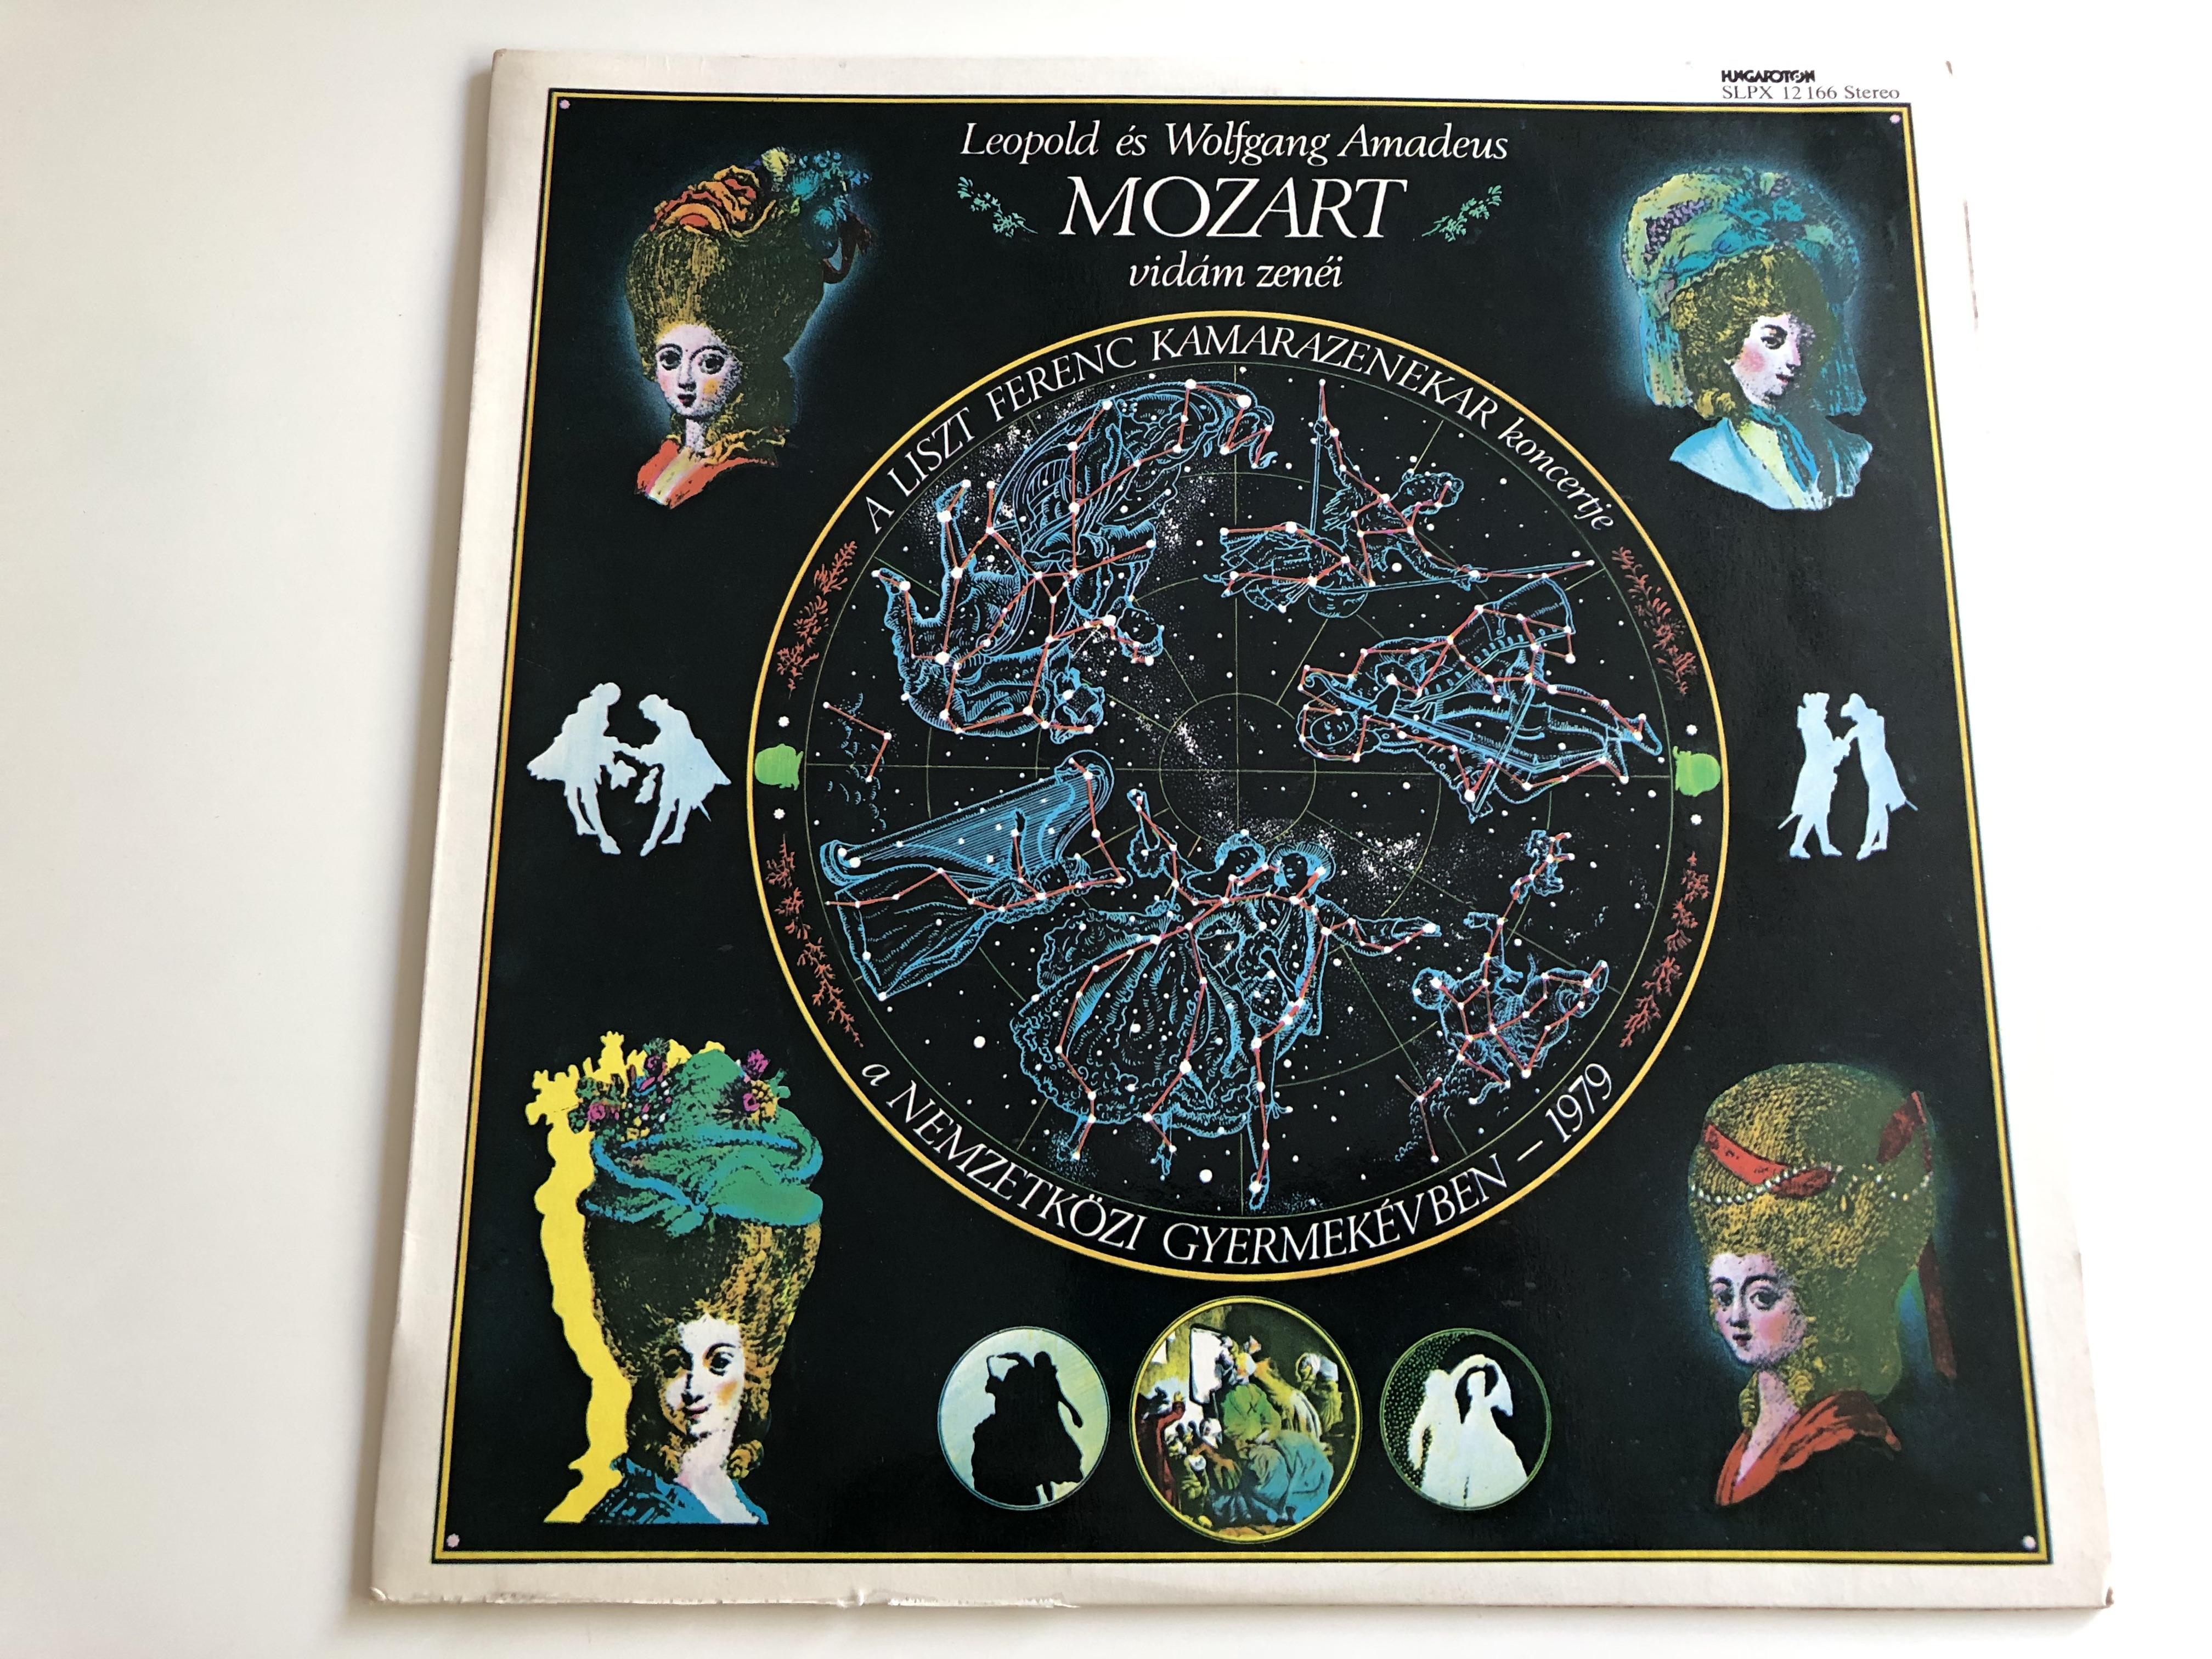 leopold-es-wolfgang-amadeus-mozart-vid-m-zen-i-conducted-j-nos-rolla-liszt-ferenc-kamarazenekar-koncertje-hungaroton-lp-stereo-slpx-12-166-1-.jpg